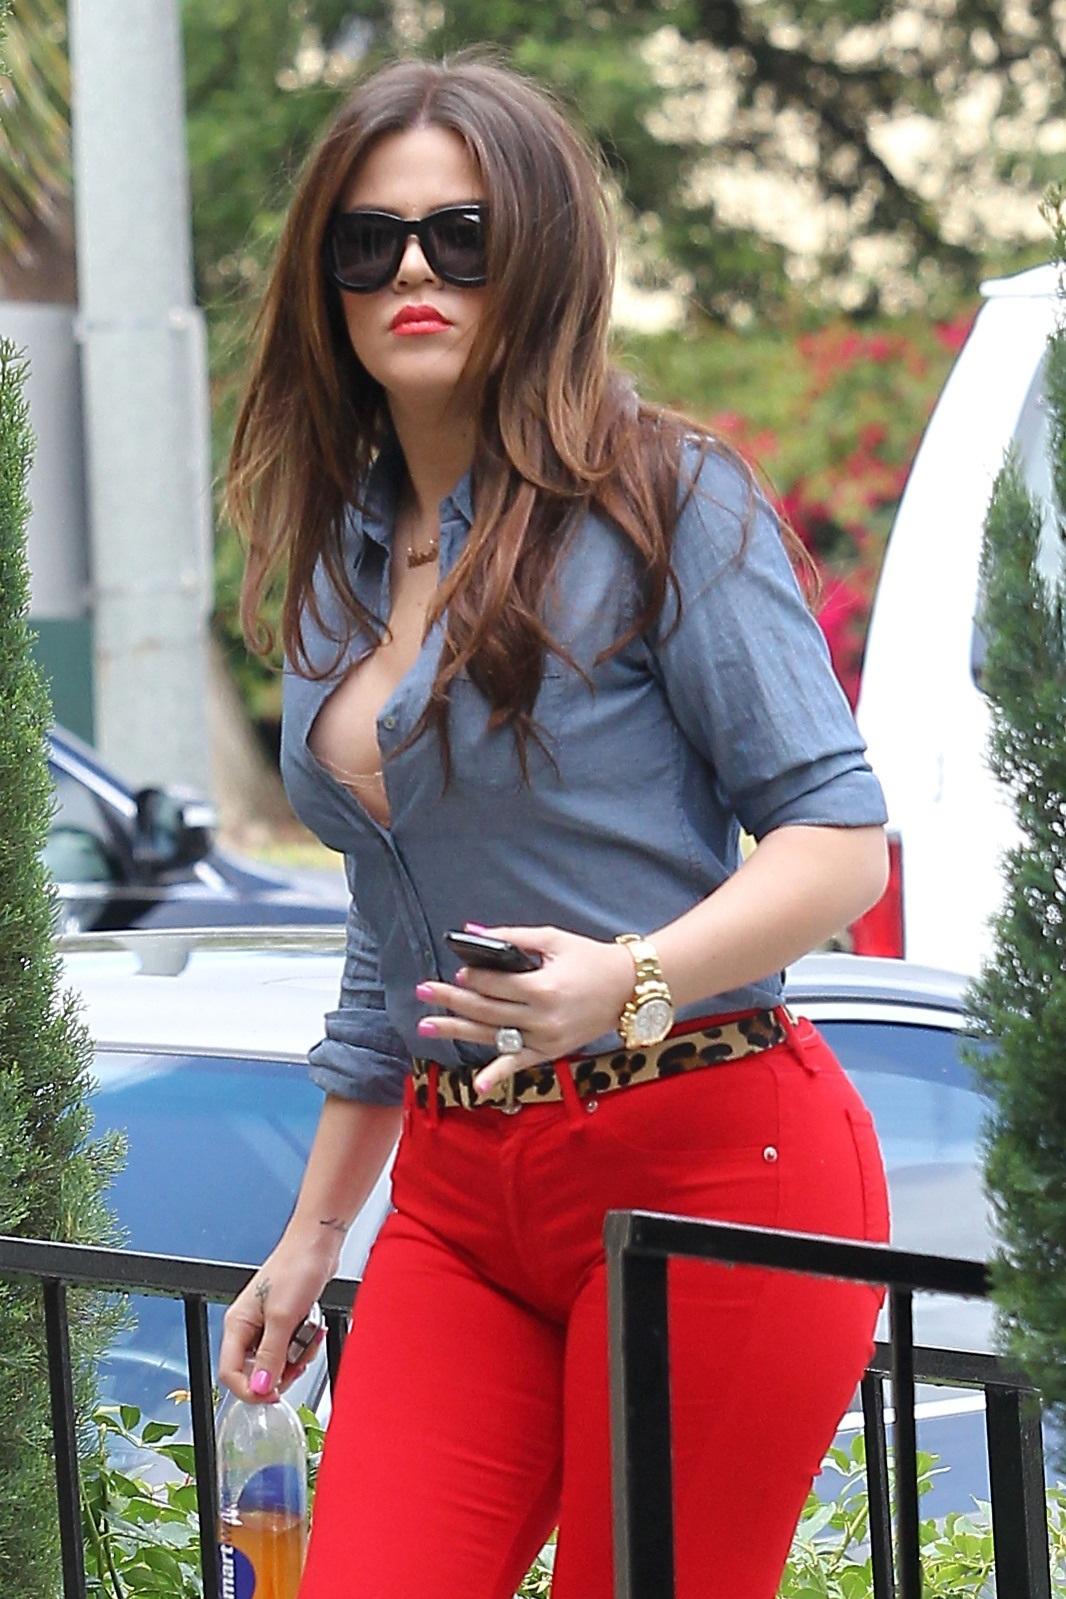 khloe kardashian video hot